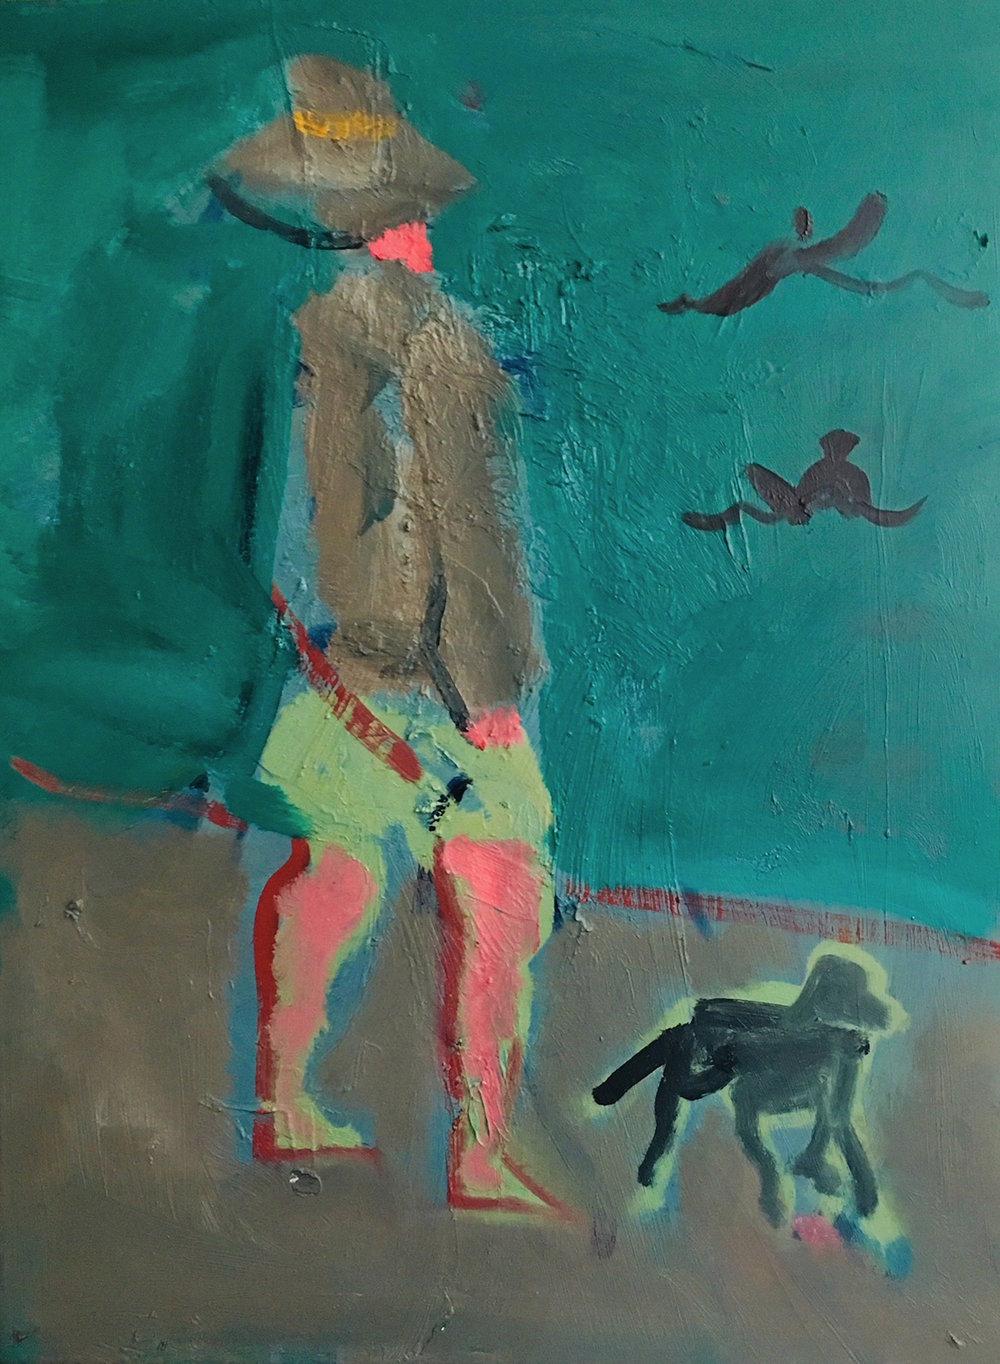 Title: Sennen Surfers  Size: 61 x 46 cm  Medium: Oil on canvas  Price: £1450